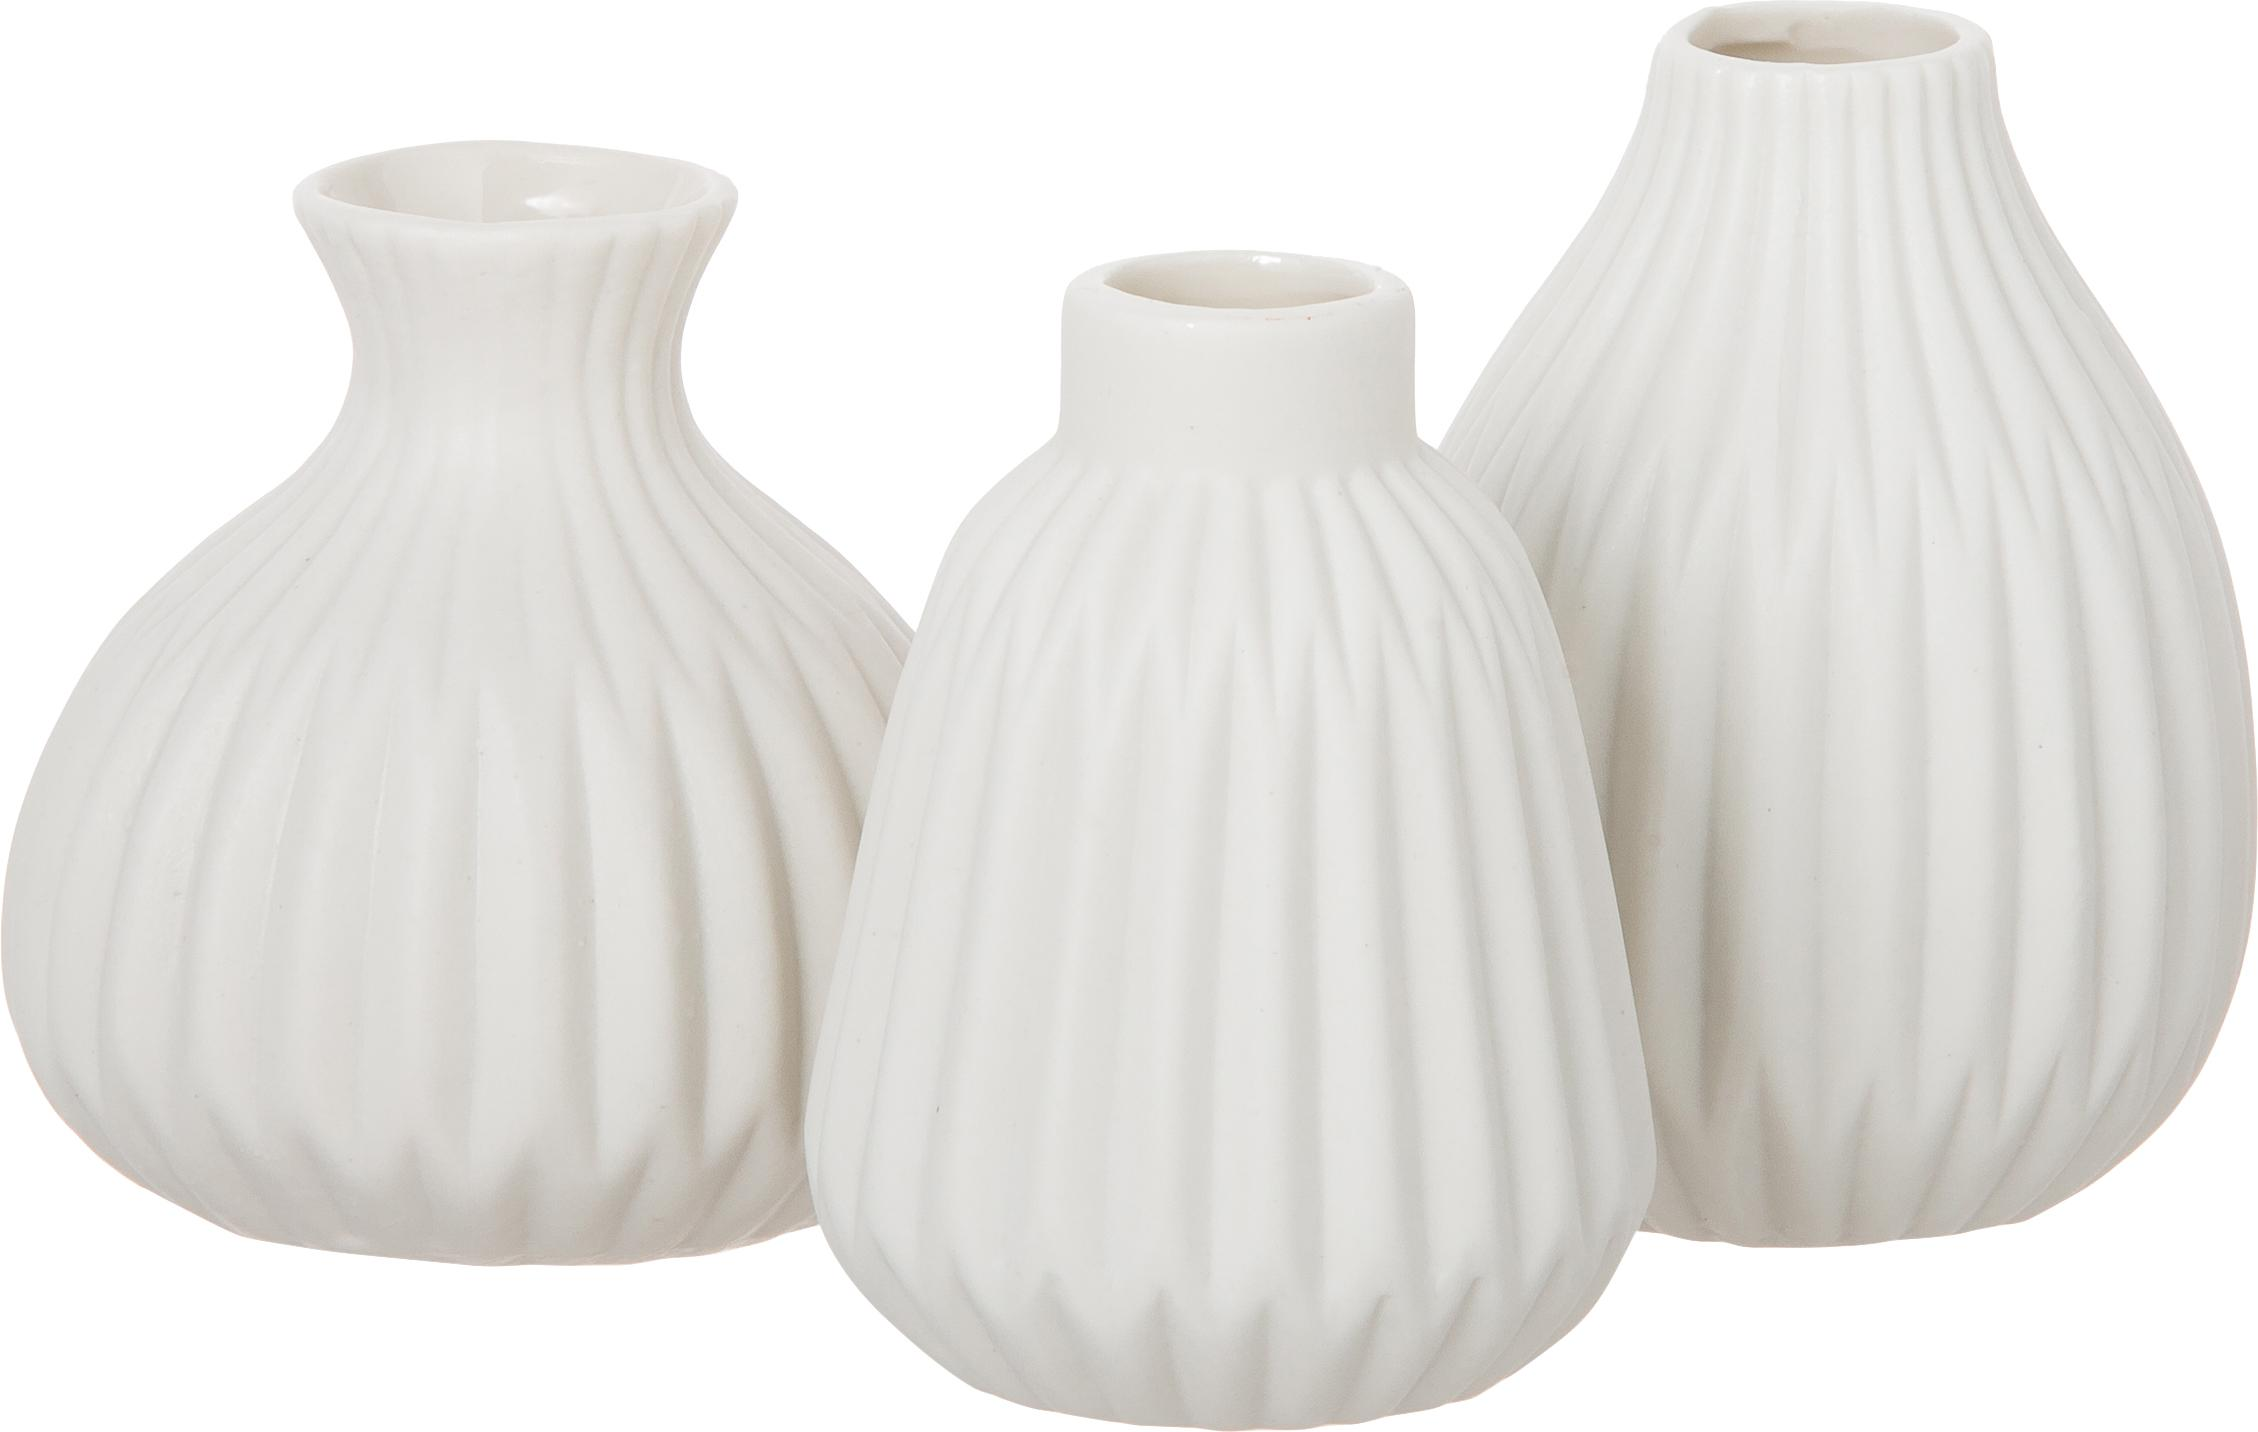 Set 3 vasi in porcellana Esko, Porcellana, Bianco, Set in varie misure